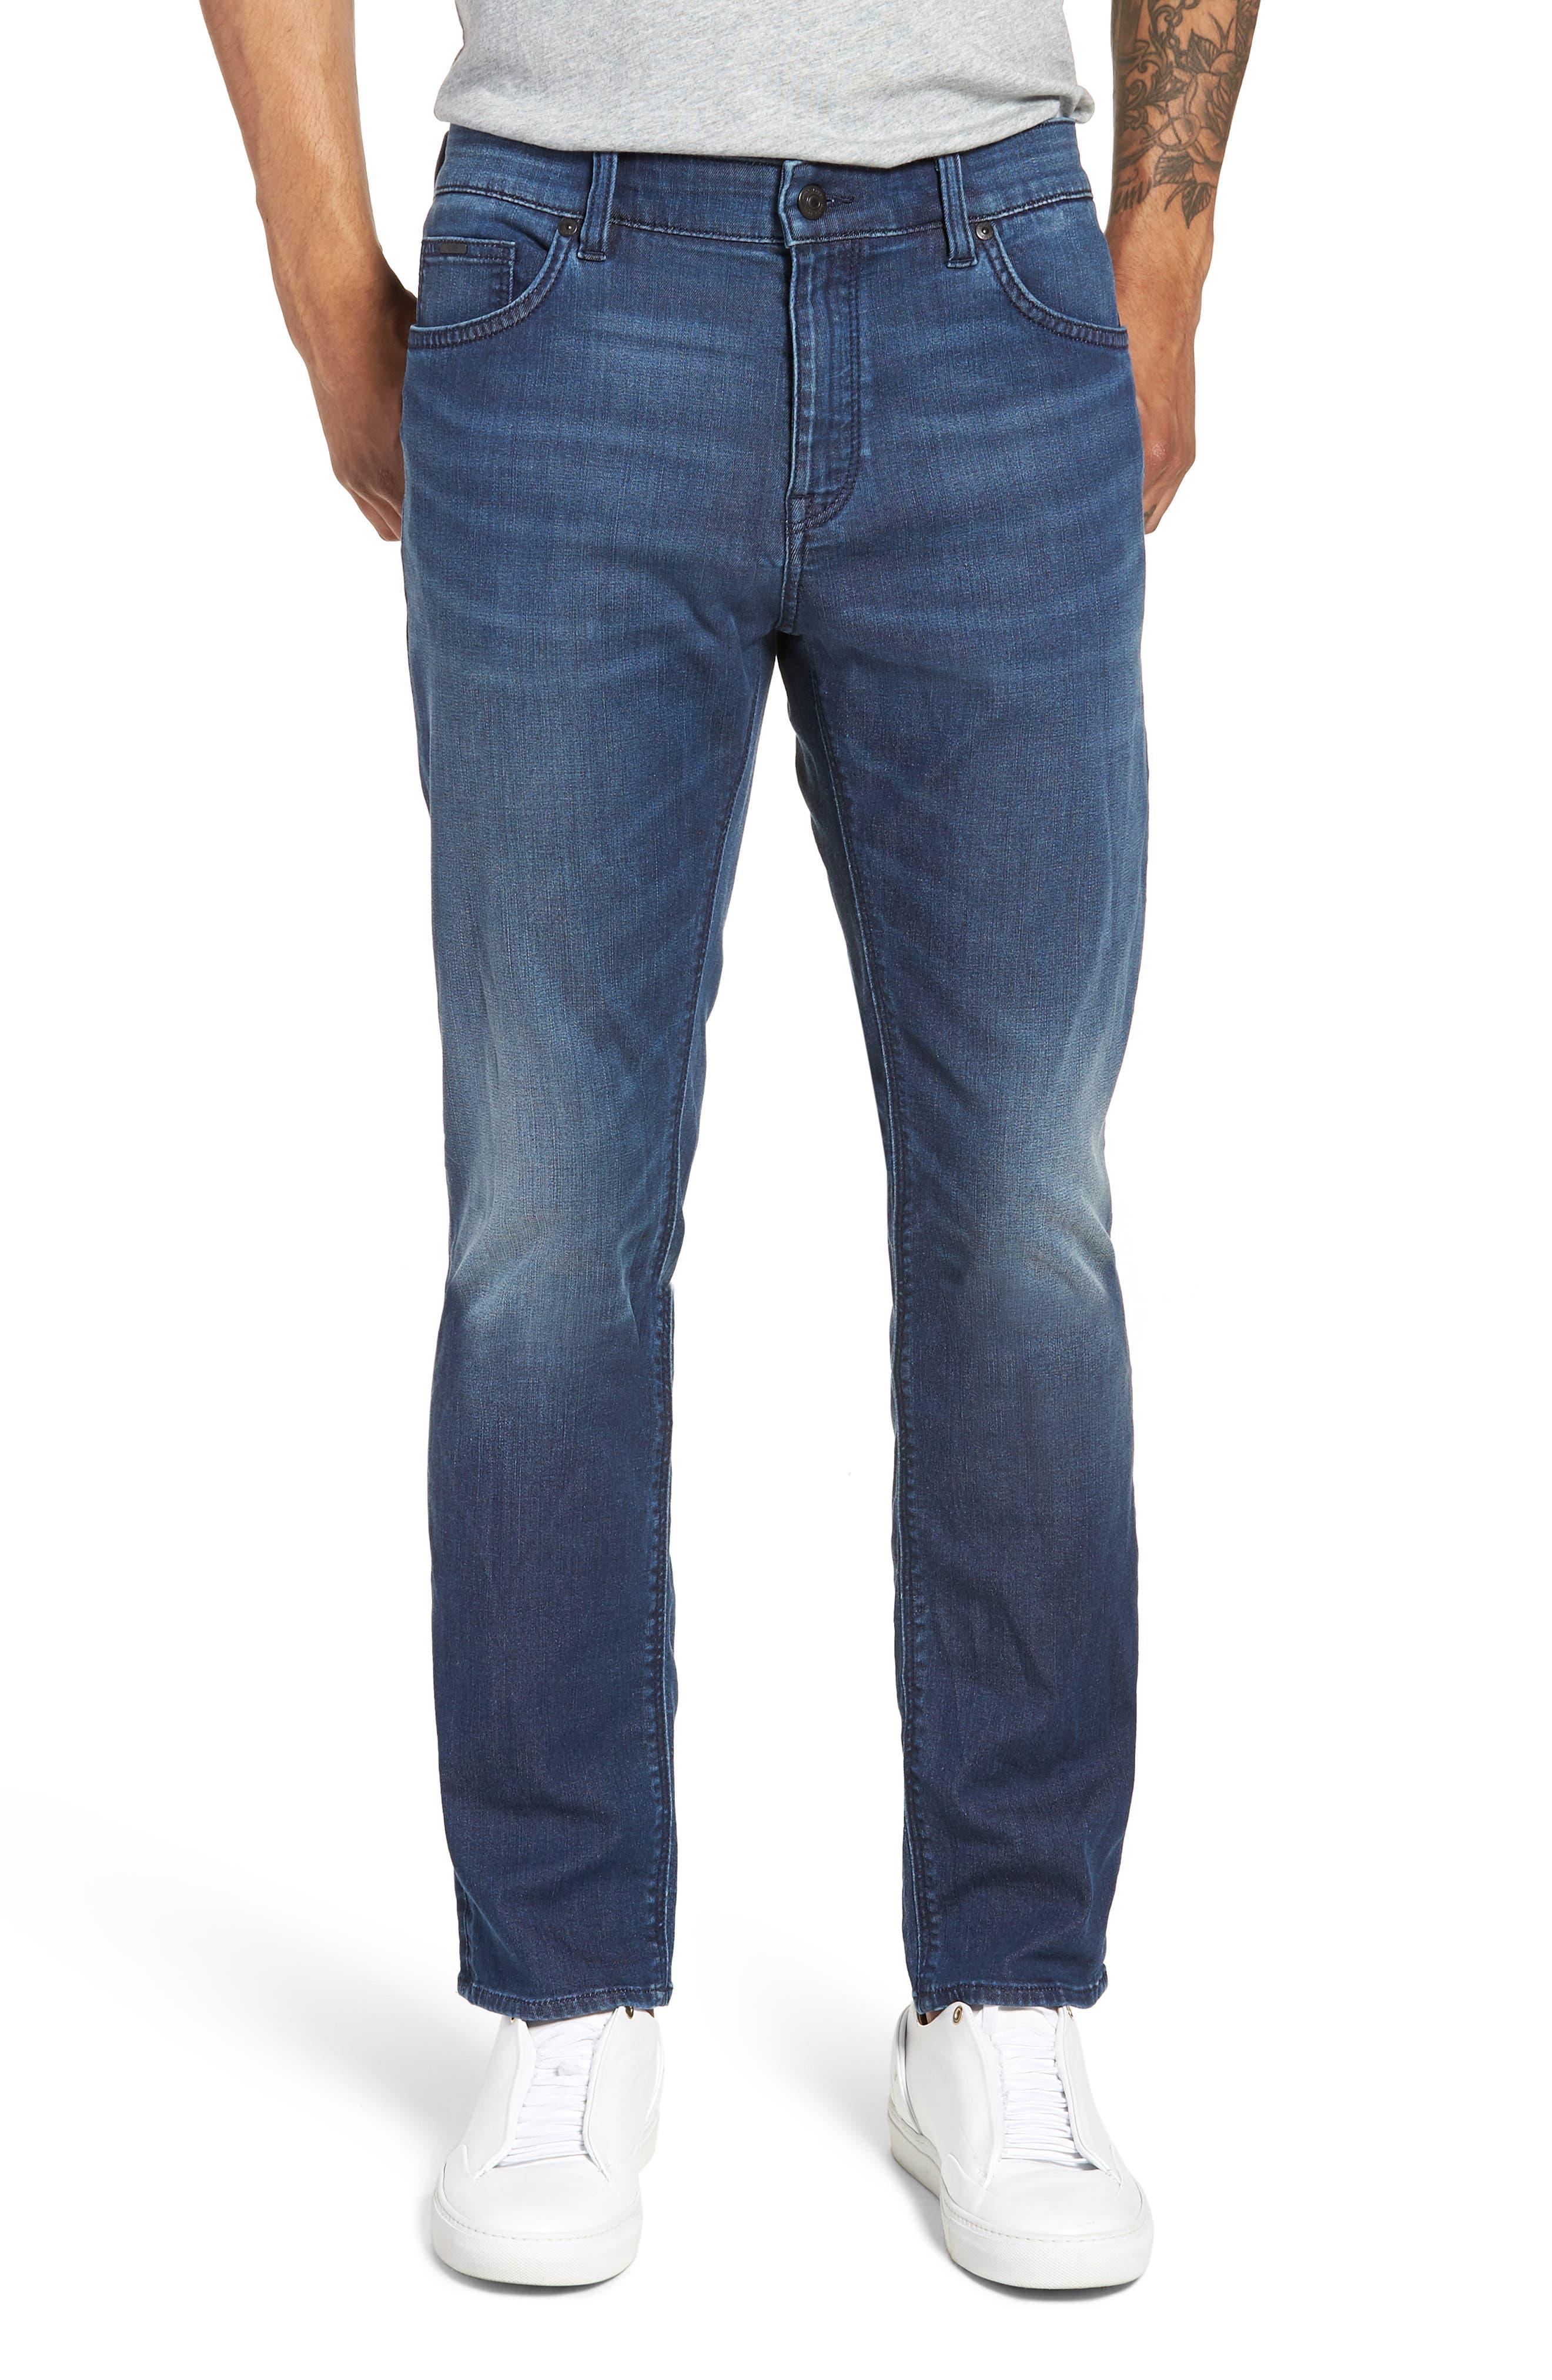 Maine Straight Leg Jeans,                         Main,                         color, Blue